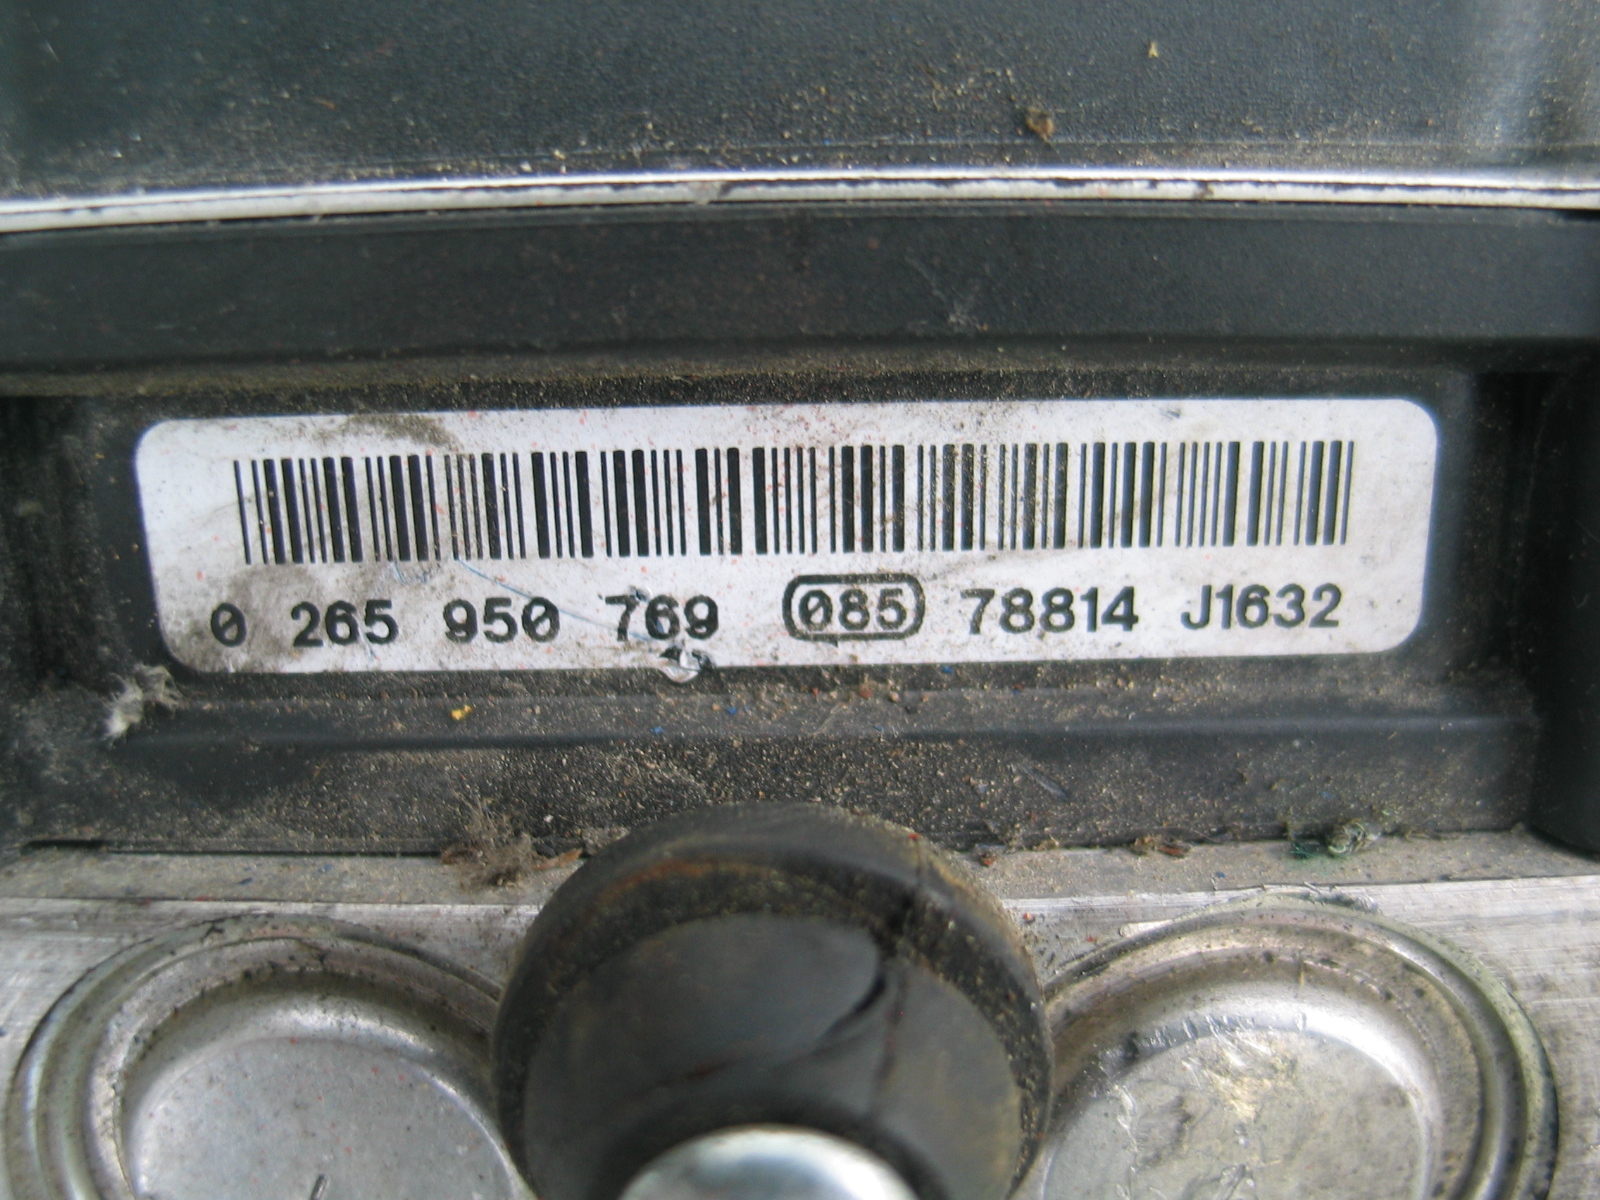 Modulo Abs  Esp Grande Punto Fiat 51798105 0265235432 Bosch 0265950769